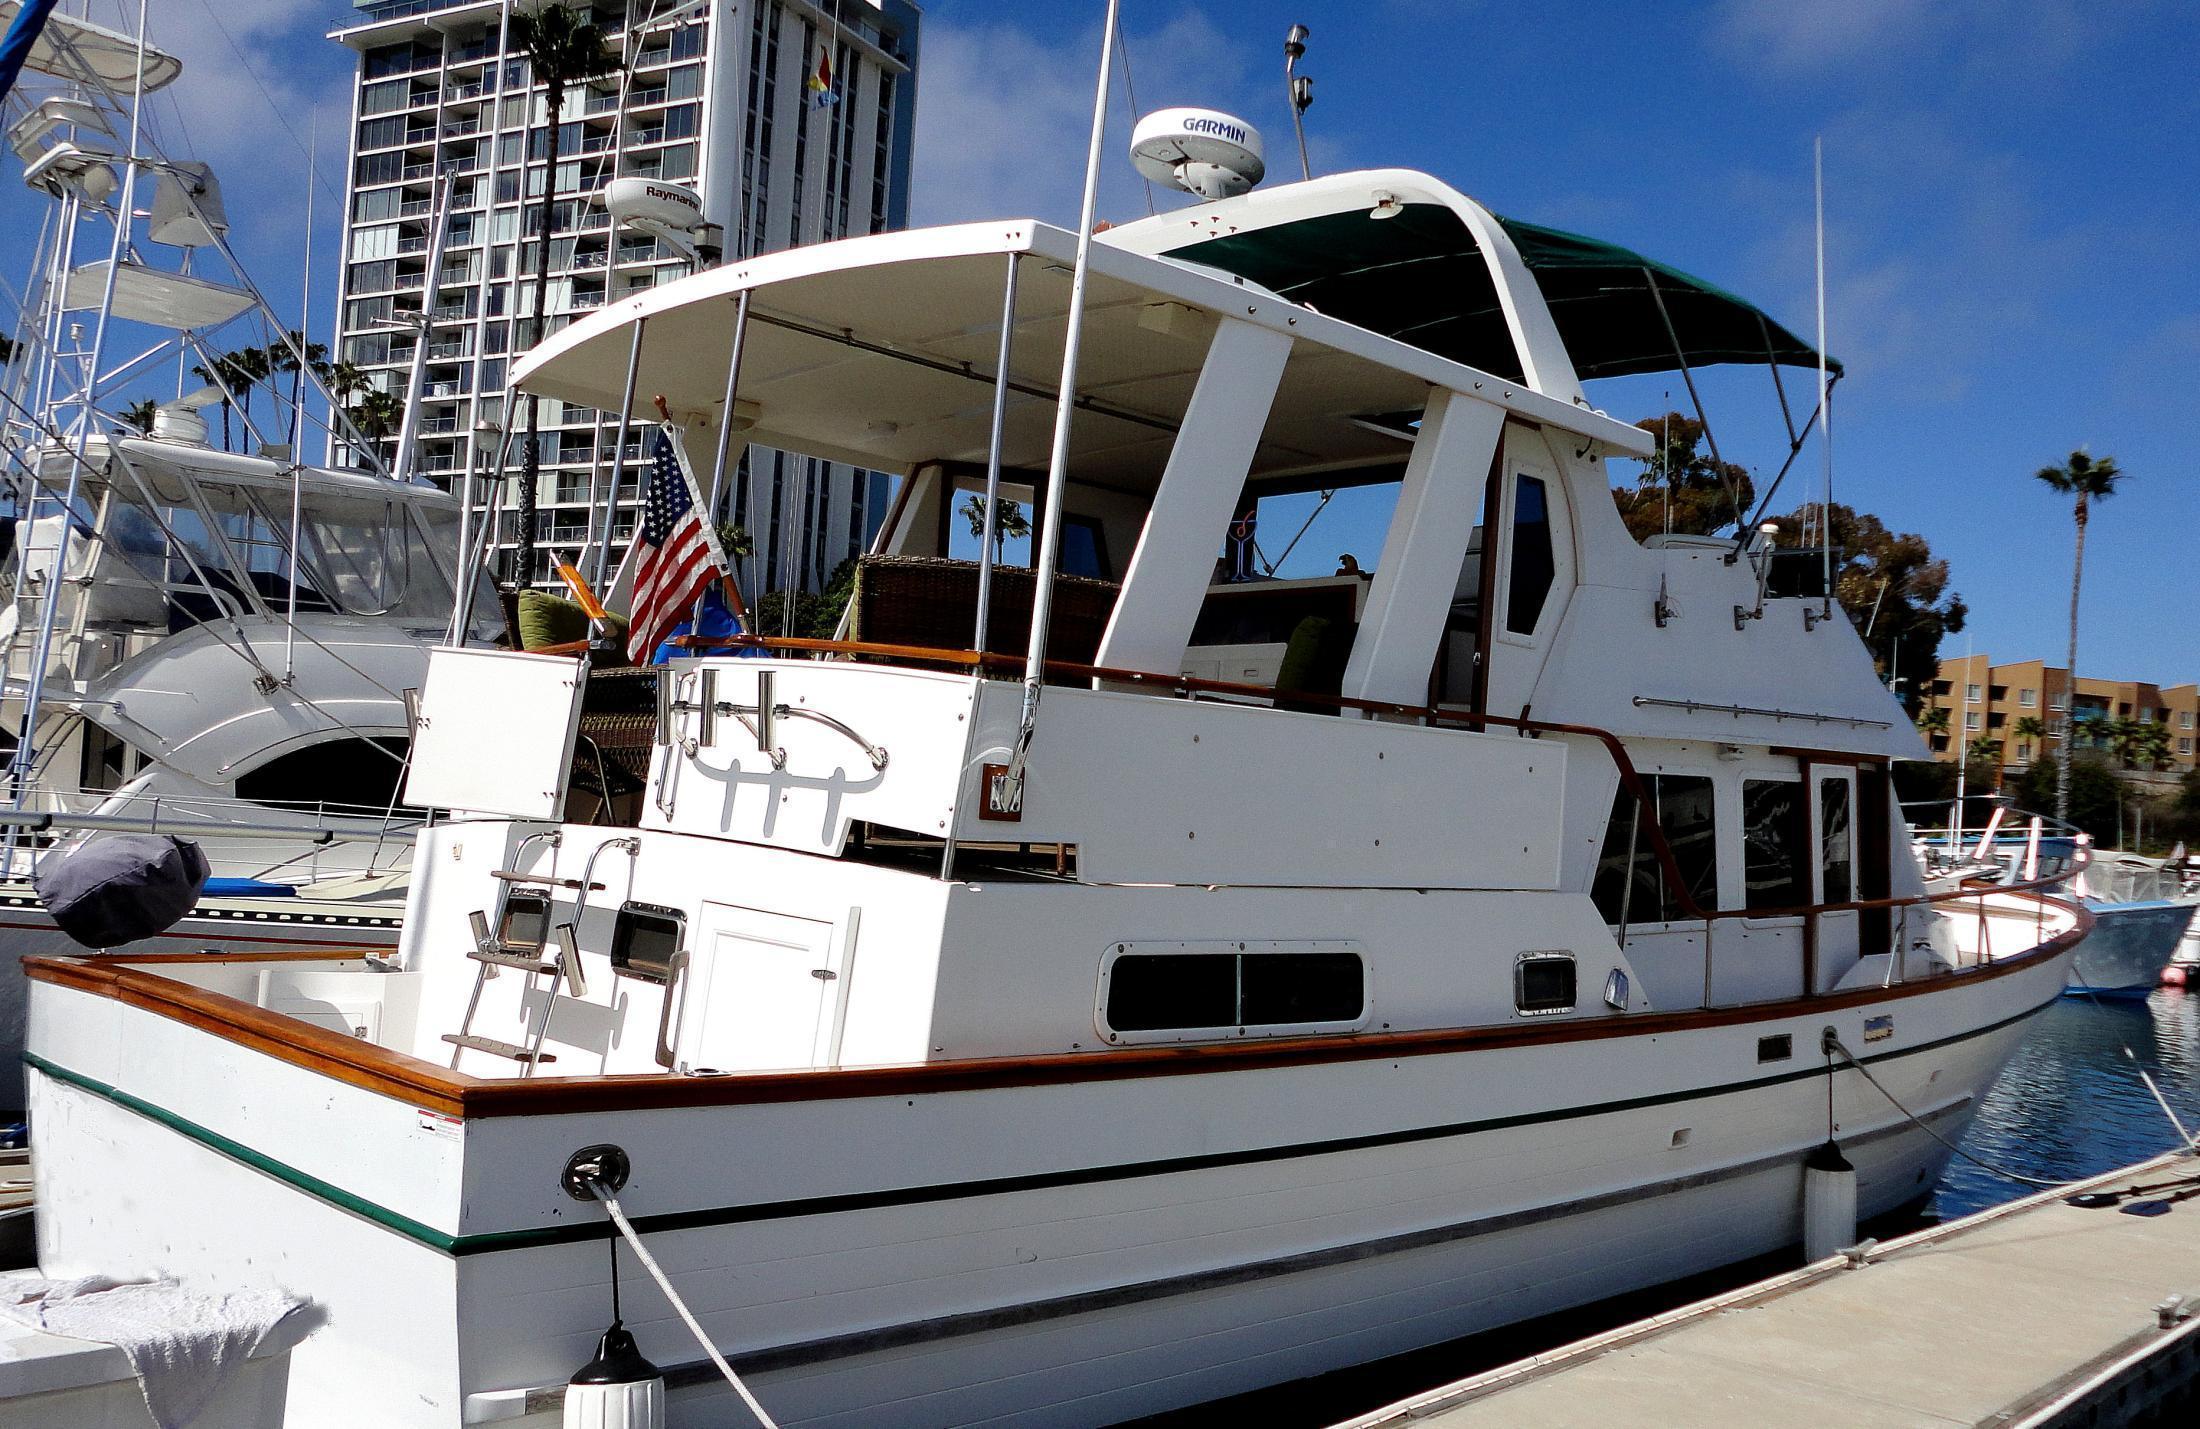 Marine Trader CPMY with SLIP, Oceanside